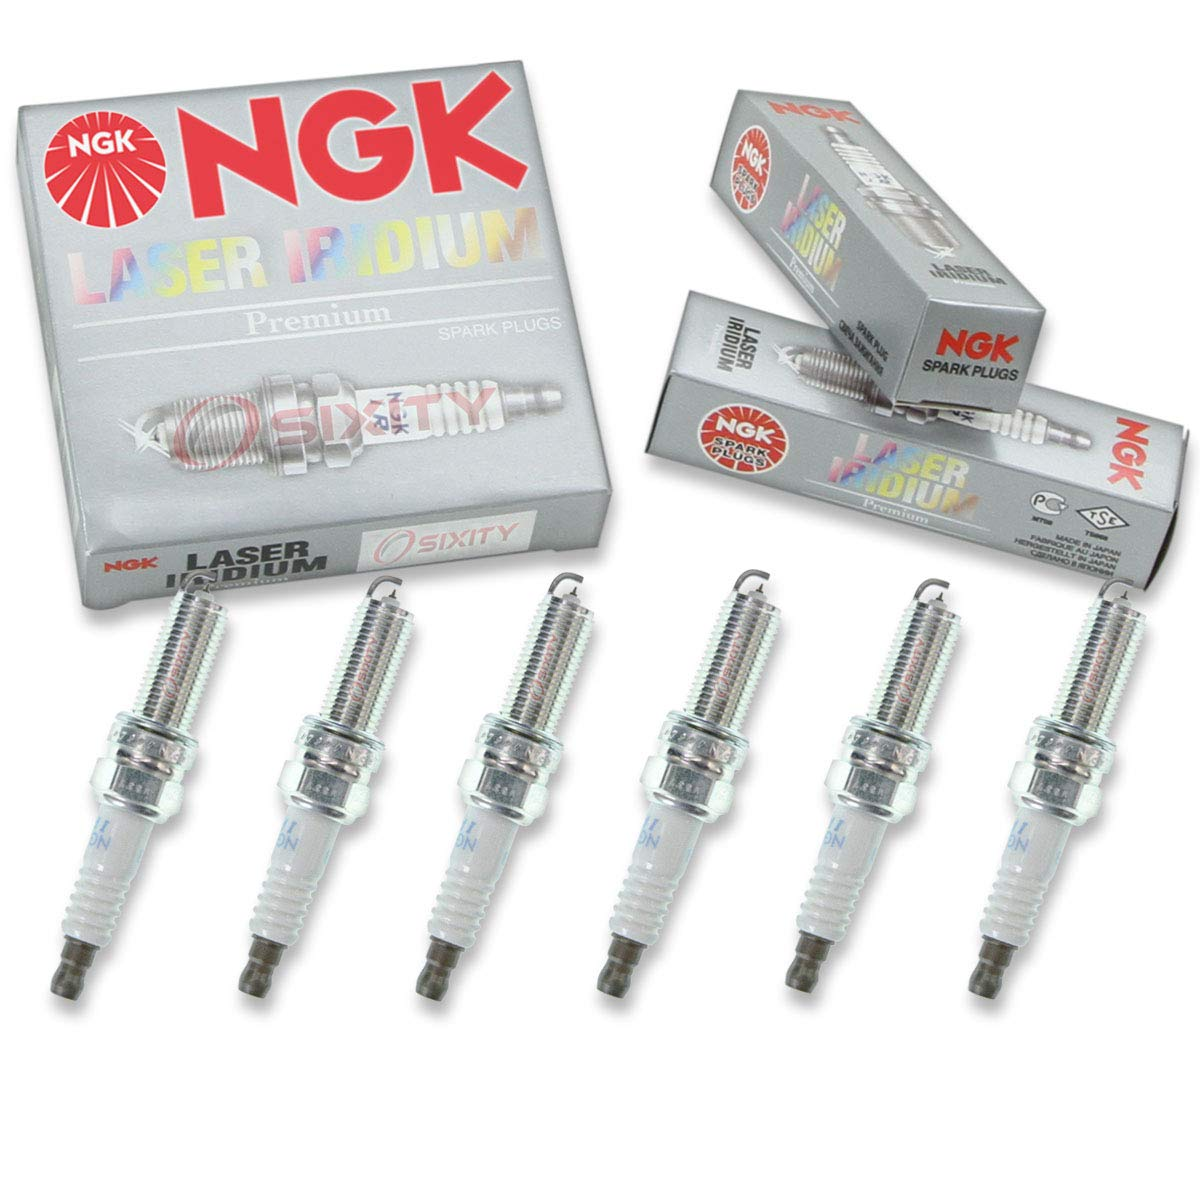 Amazon com: NGK Laser Iridium 6pcs Spark Plugs Jeep Wrangler